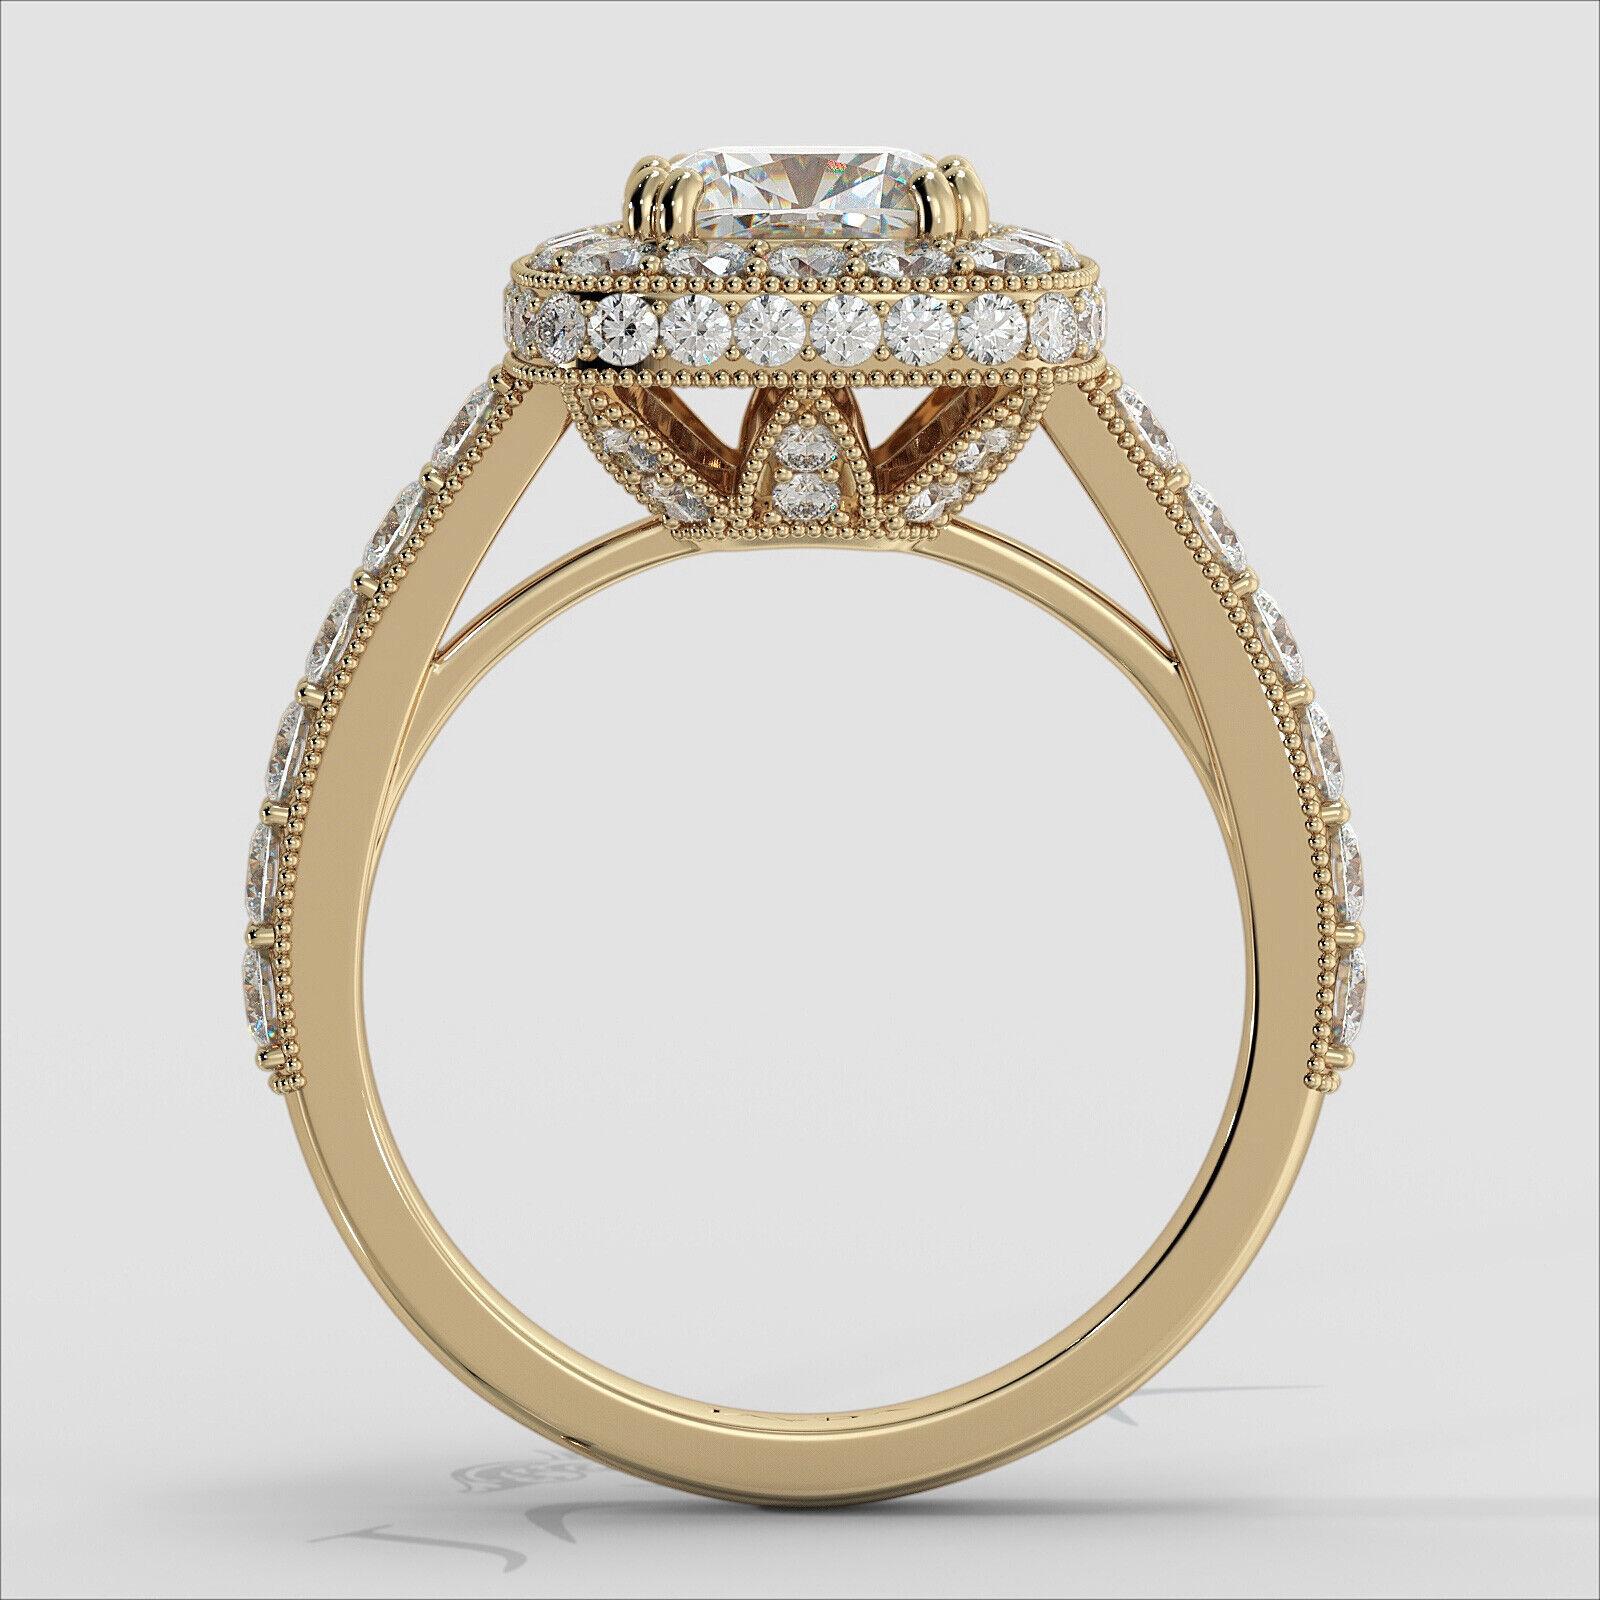 2.12ctw Milgrain Floral Basket Cushion Diamond Engagement Ring GIA I-SI2 W Gold 10